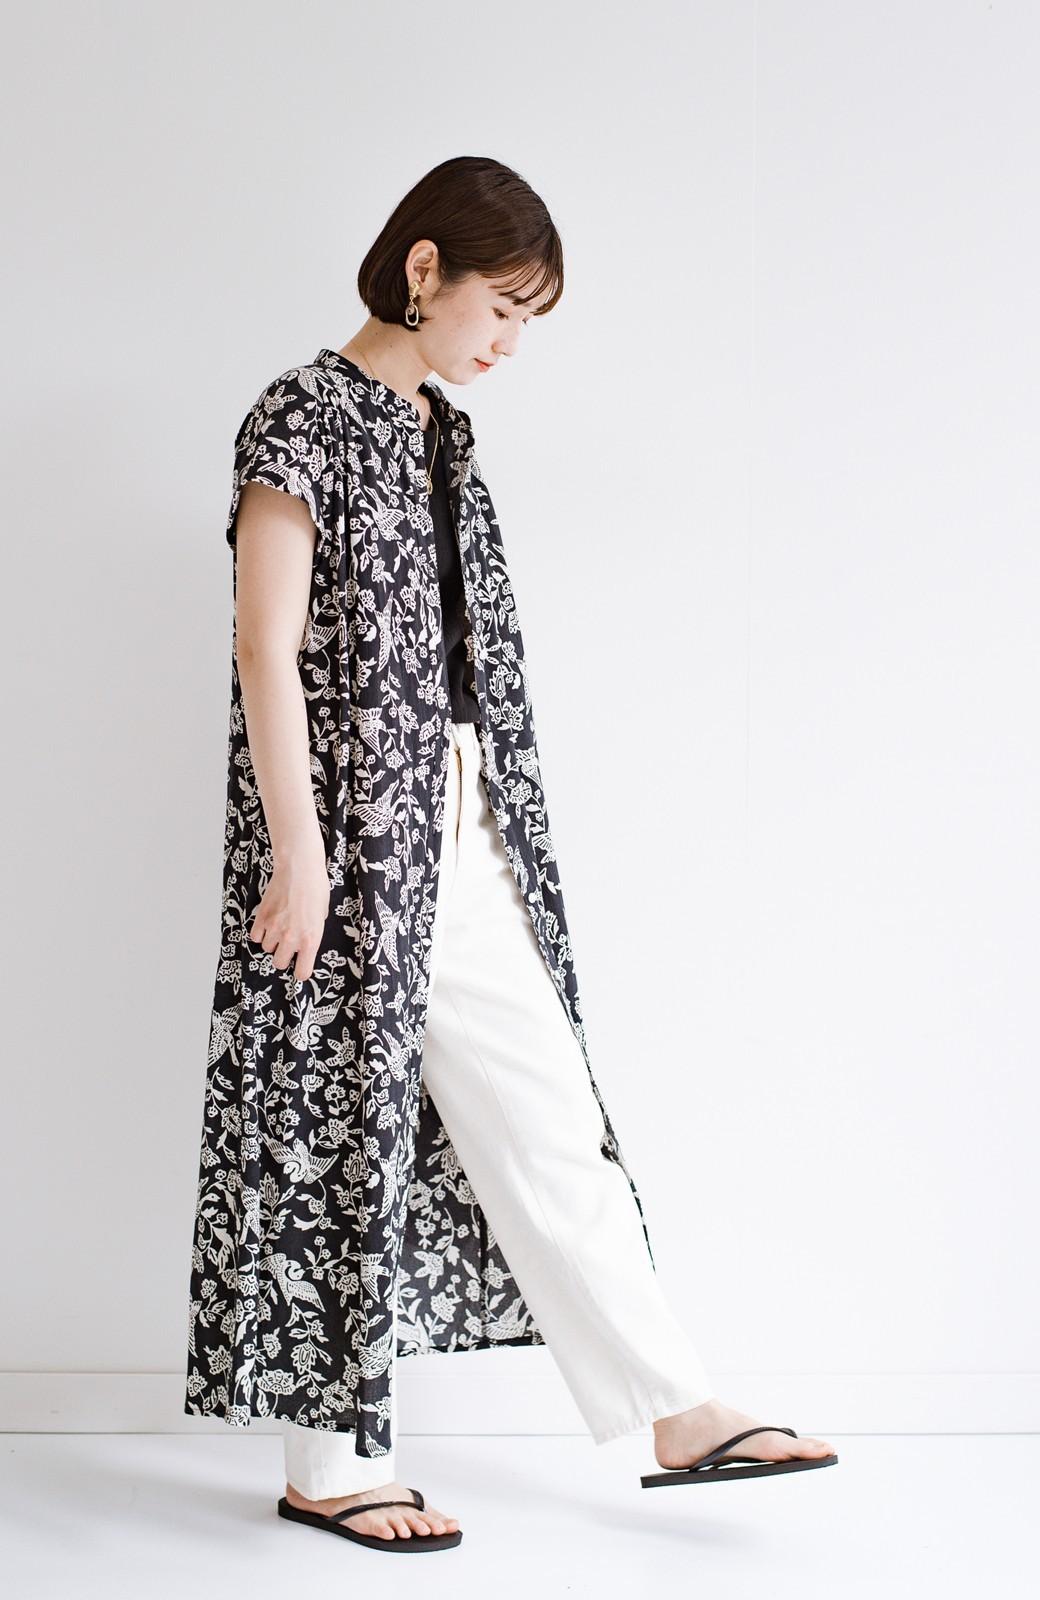 haco! 京都の浴衣屋さんと作った浴衣生地の羽織ってもかわいいロングワンピース <ブラック系その他>の商品写真19